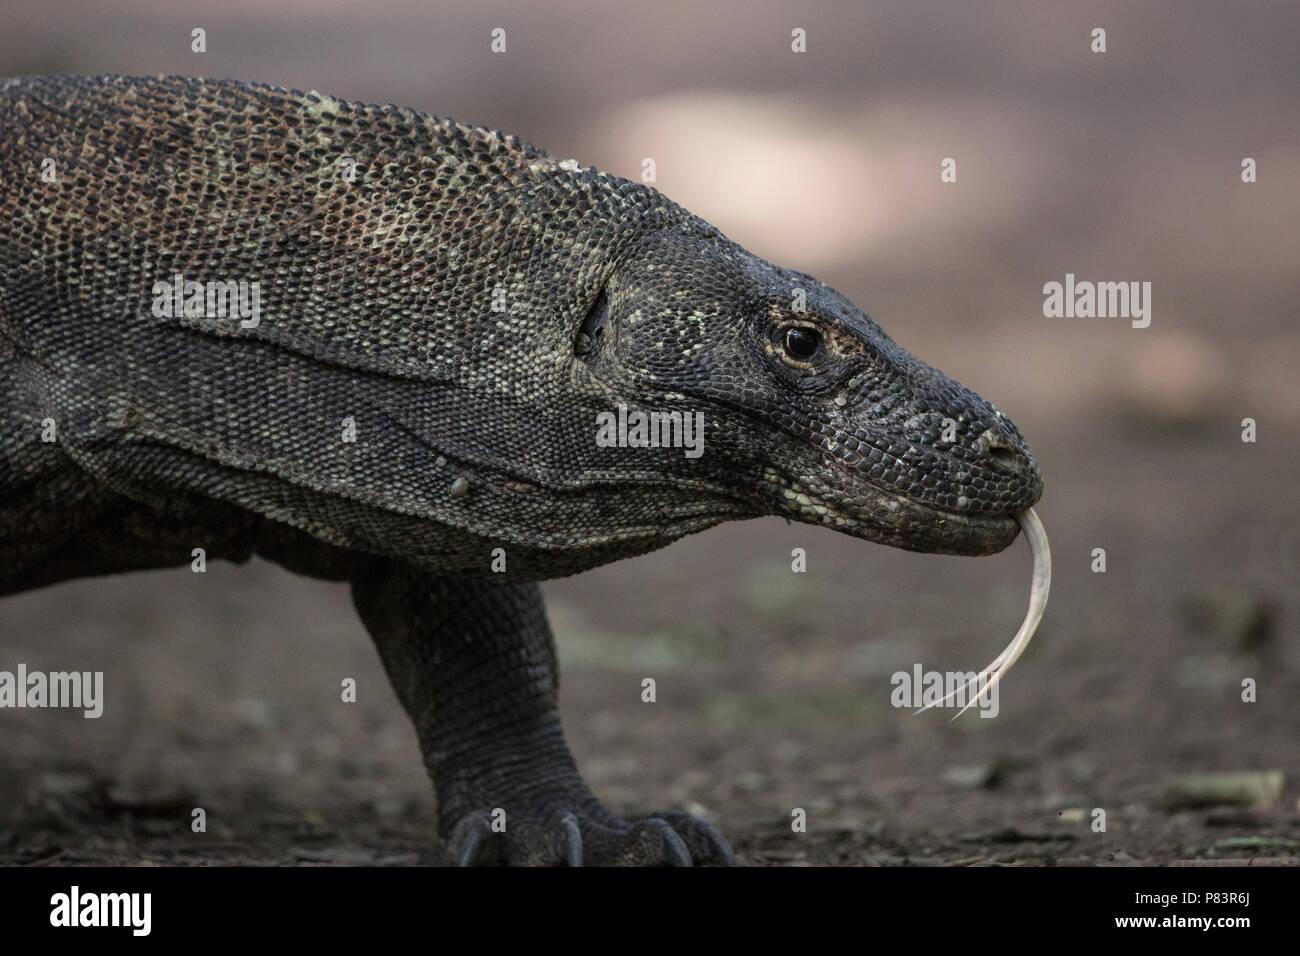 Komodo Dragon, close up with forked tongue, Komodo National Park - Stock Image